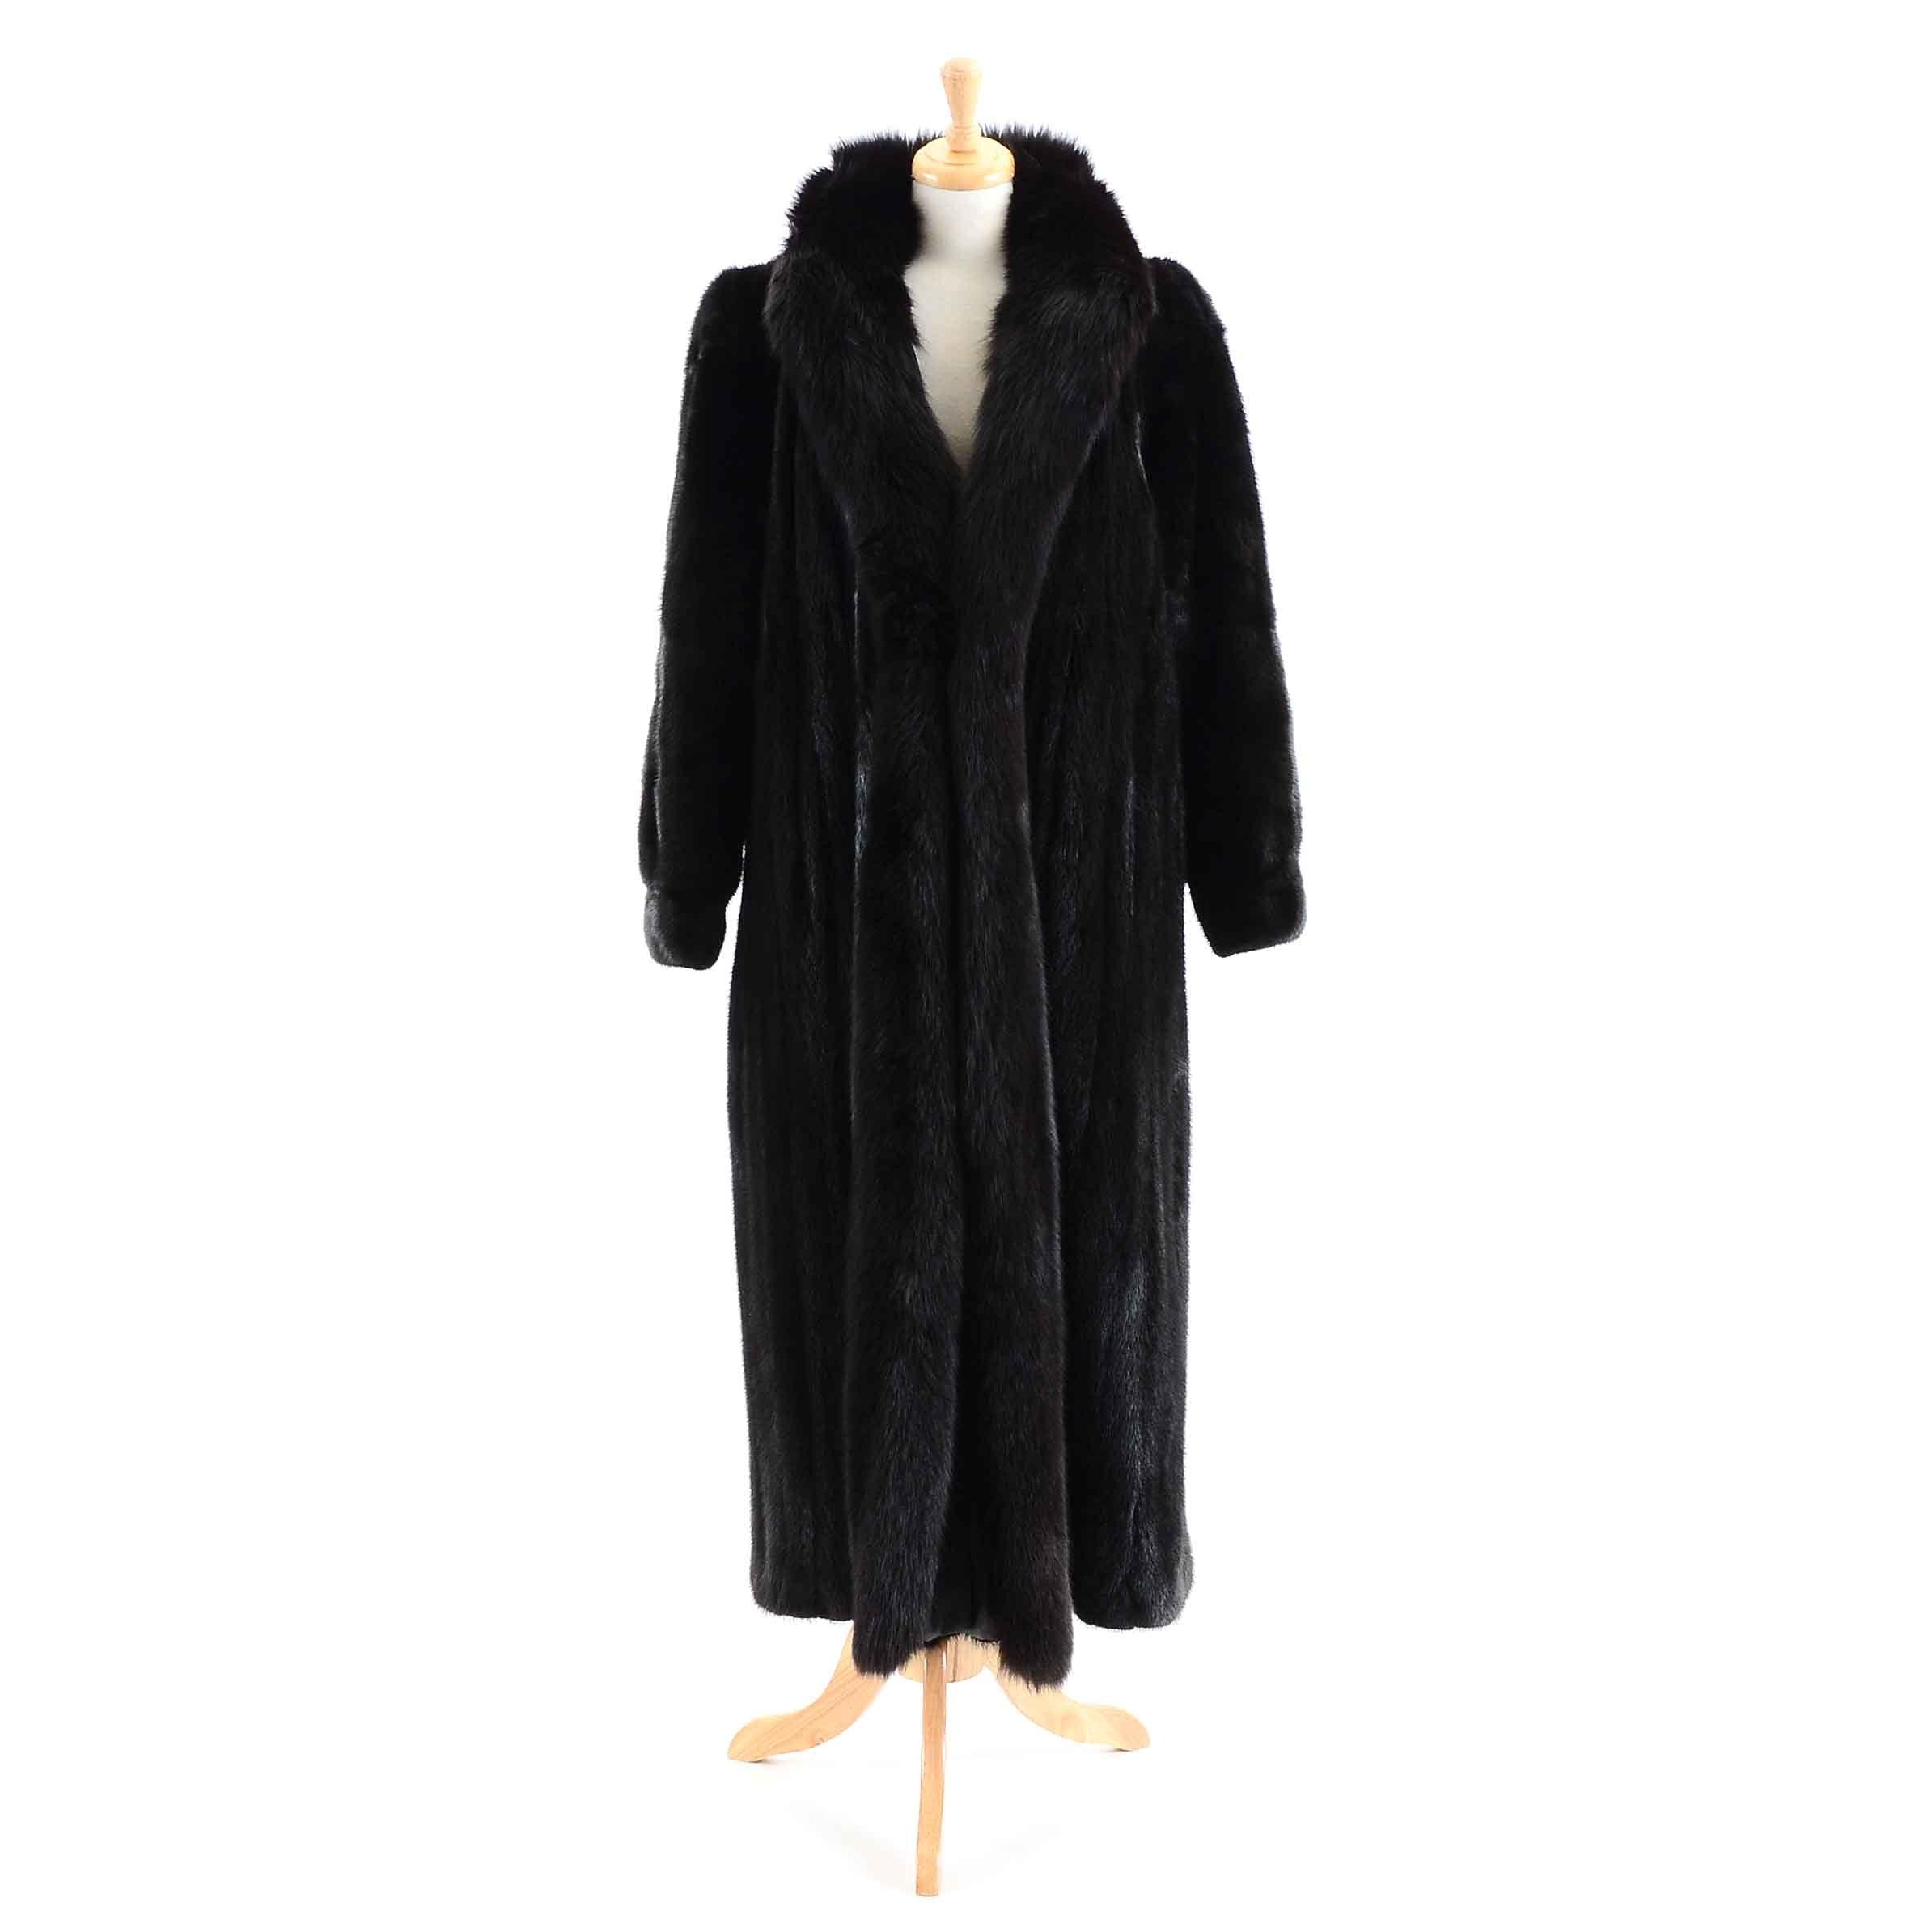 Vintage Mink and Fox Fur Coat